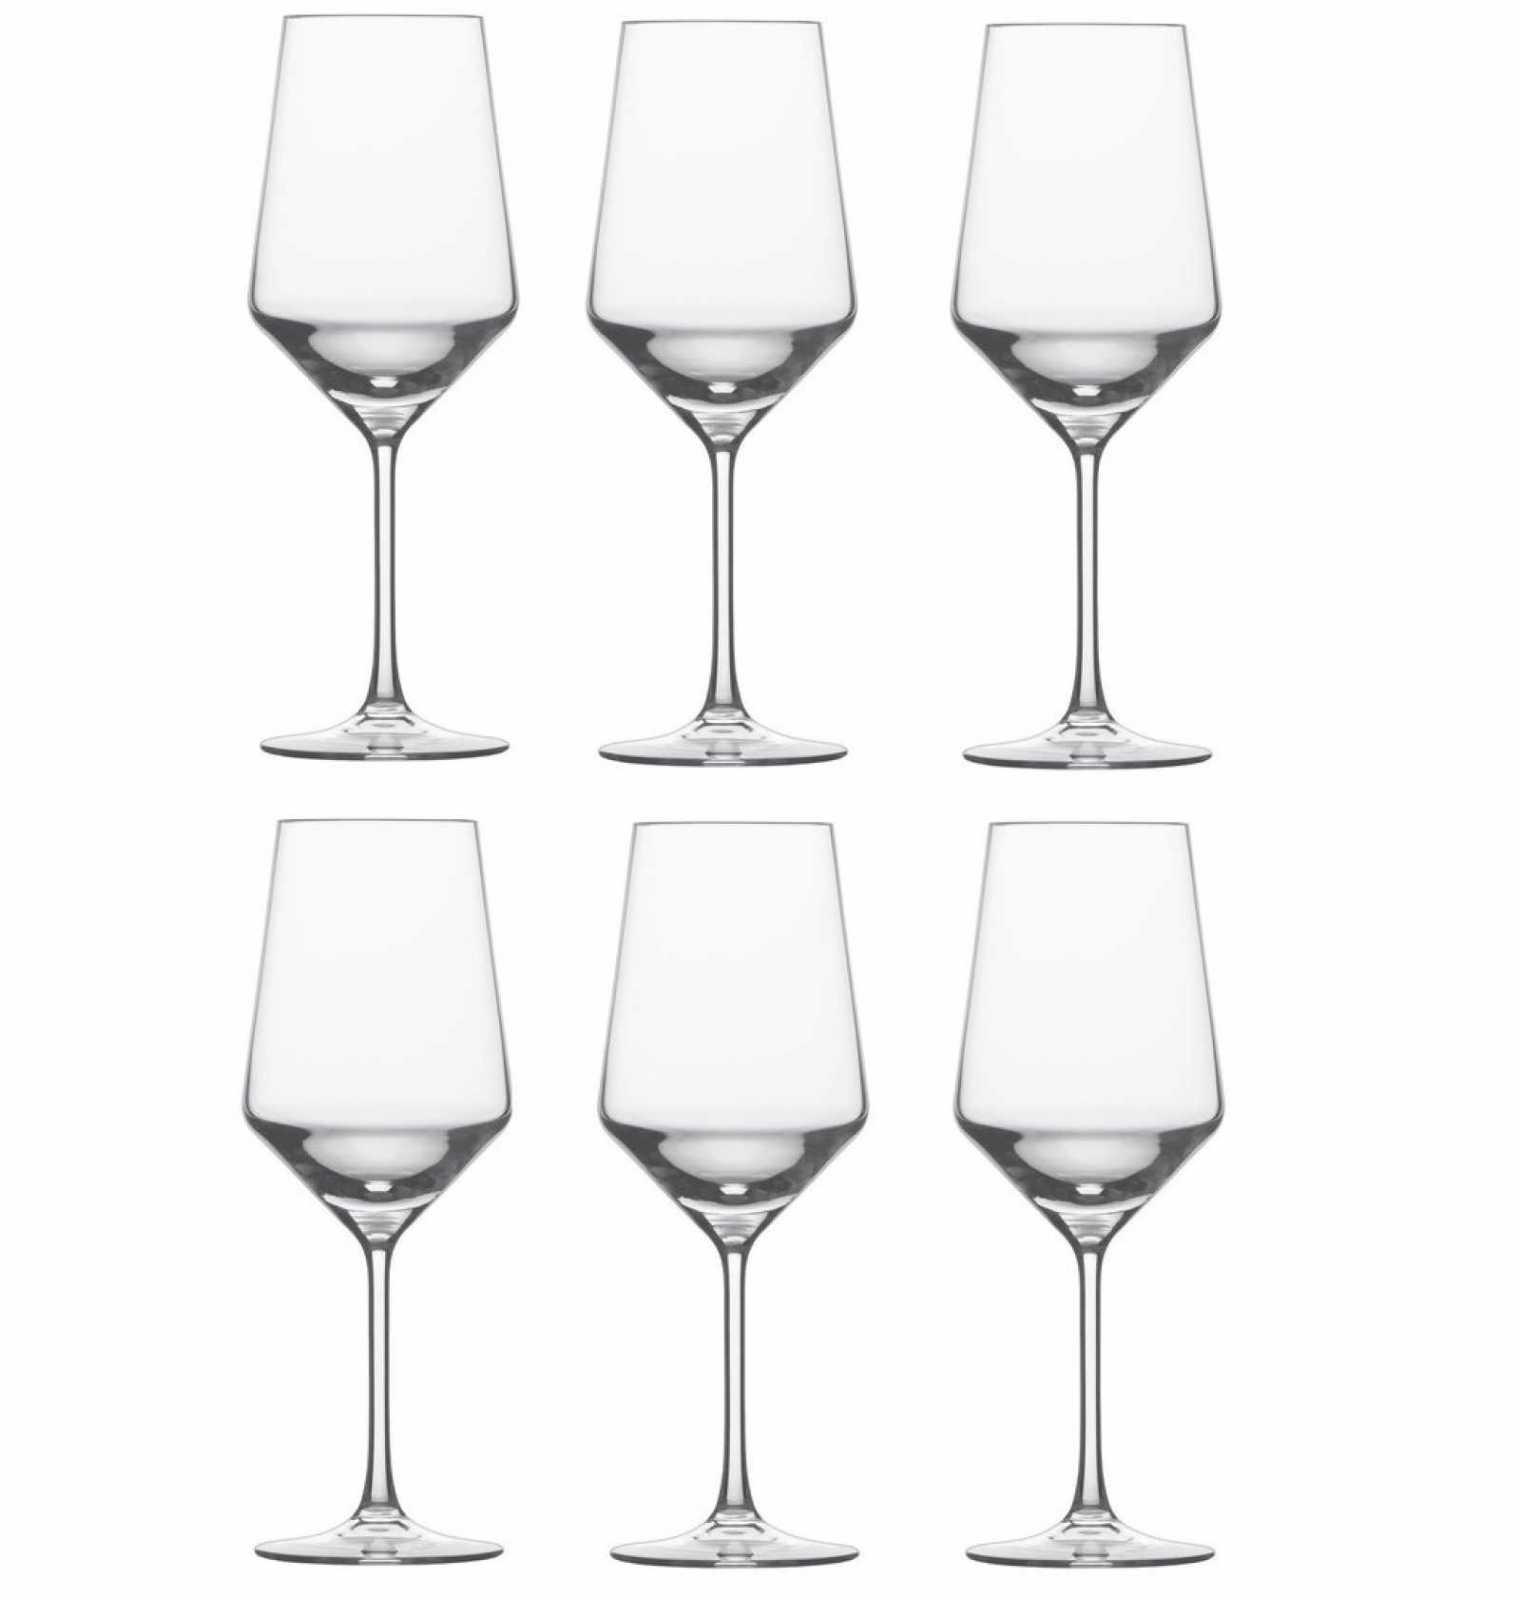 Онлайн каталог PROMENU: Набор бокалов для красного вина Schott Zwiesel PURE, объем 0,54 л, прозрачный, 6 штук Schott Zwiesel 112413_6шт